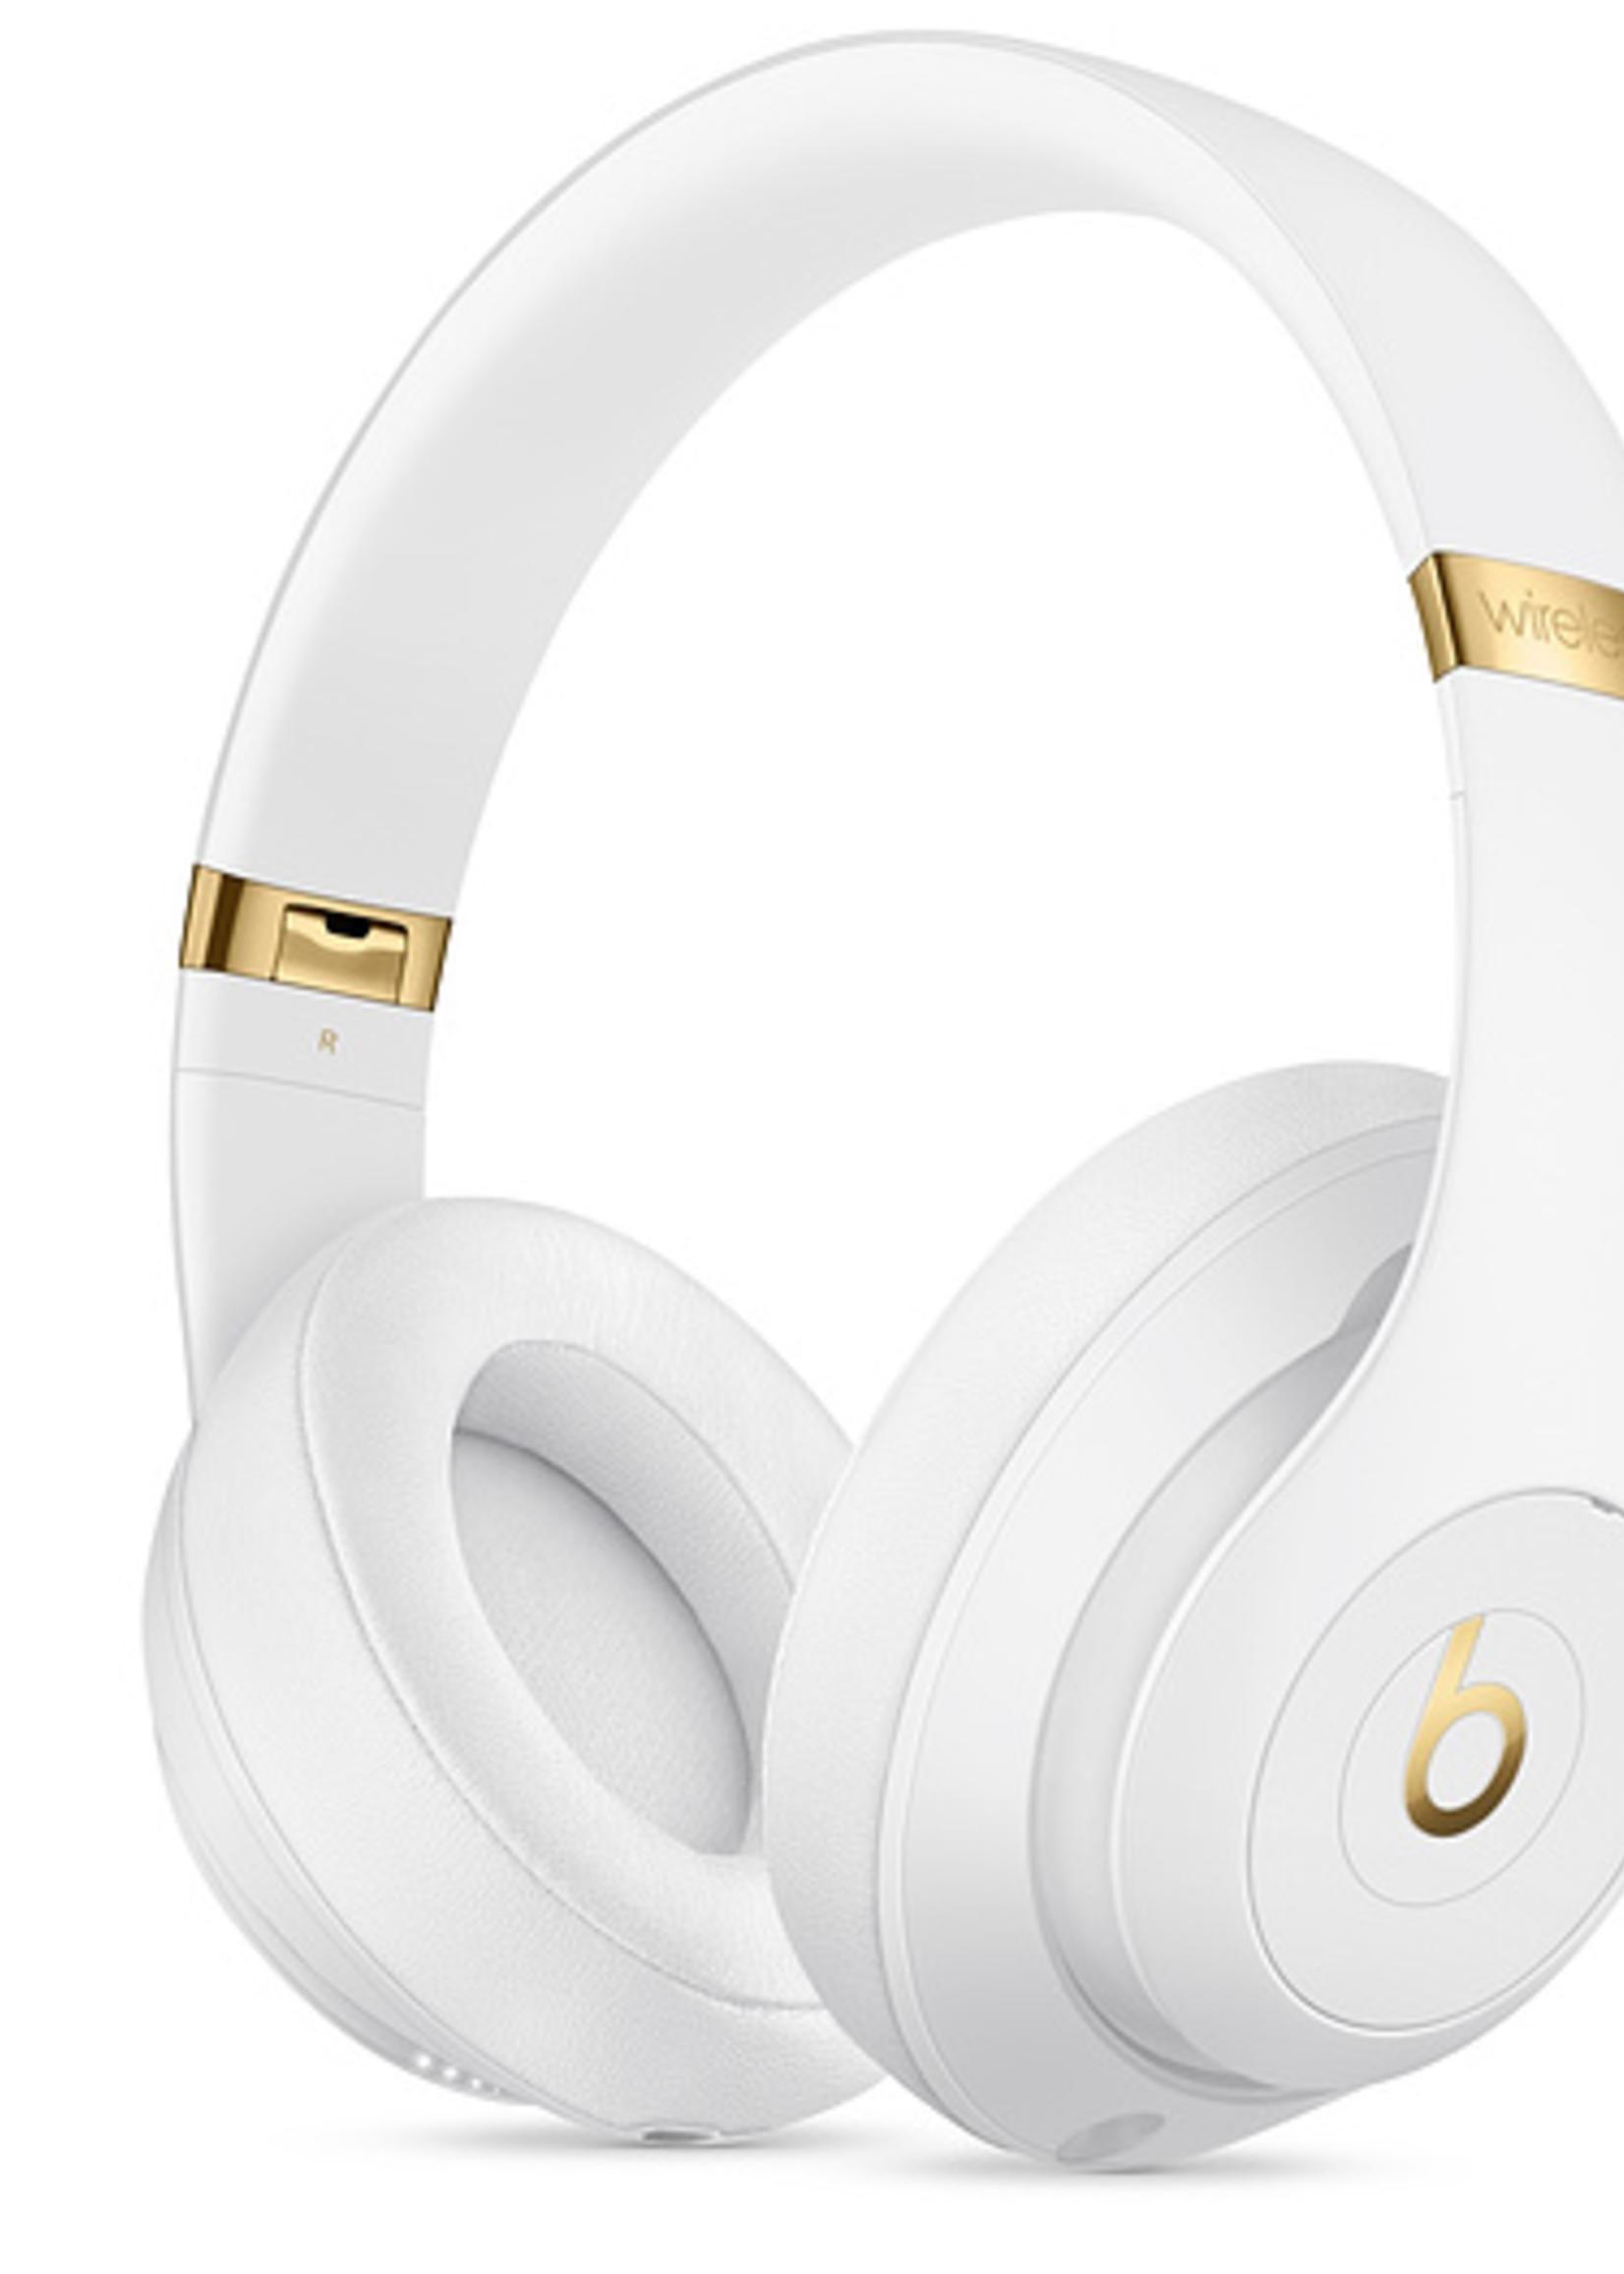 Beats Studio 3 Wireless Over-Ear Headphones - White